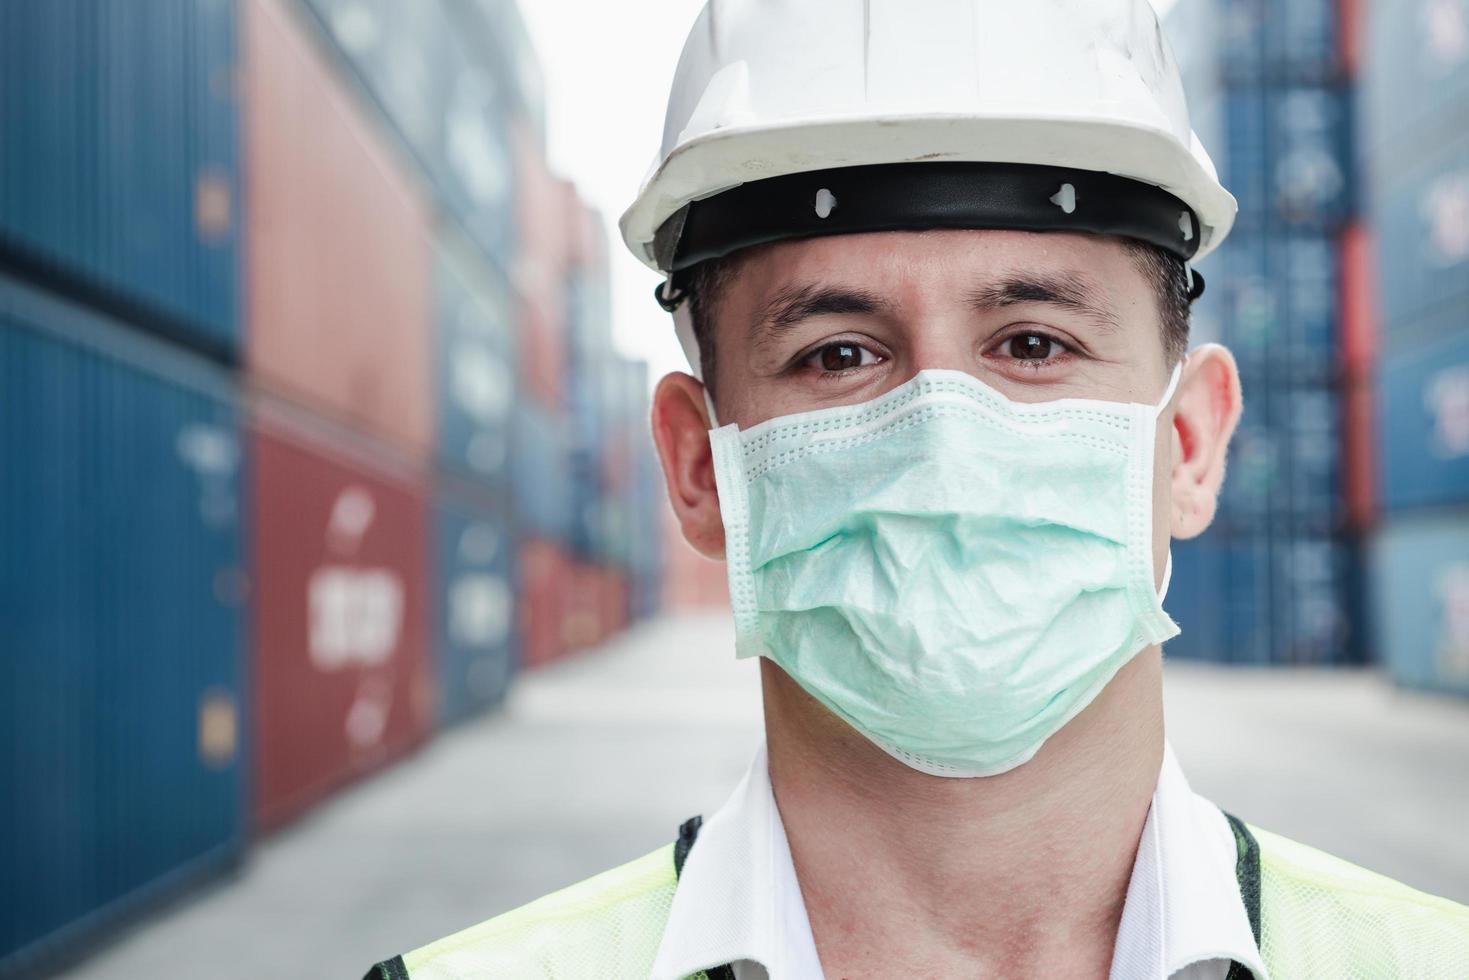 Transport engineer worker photo